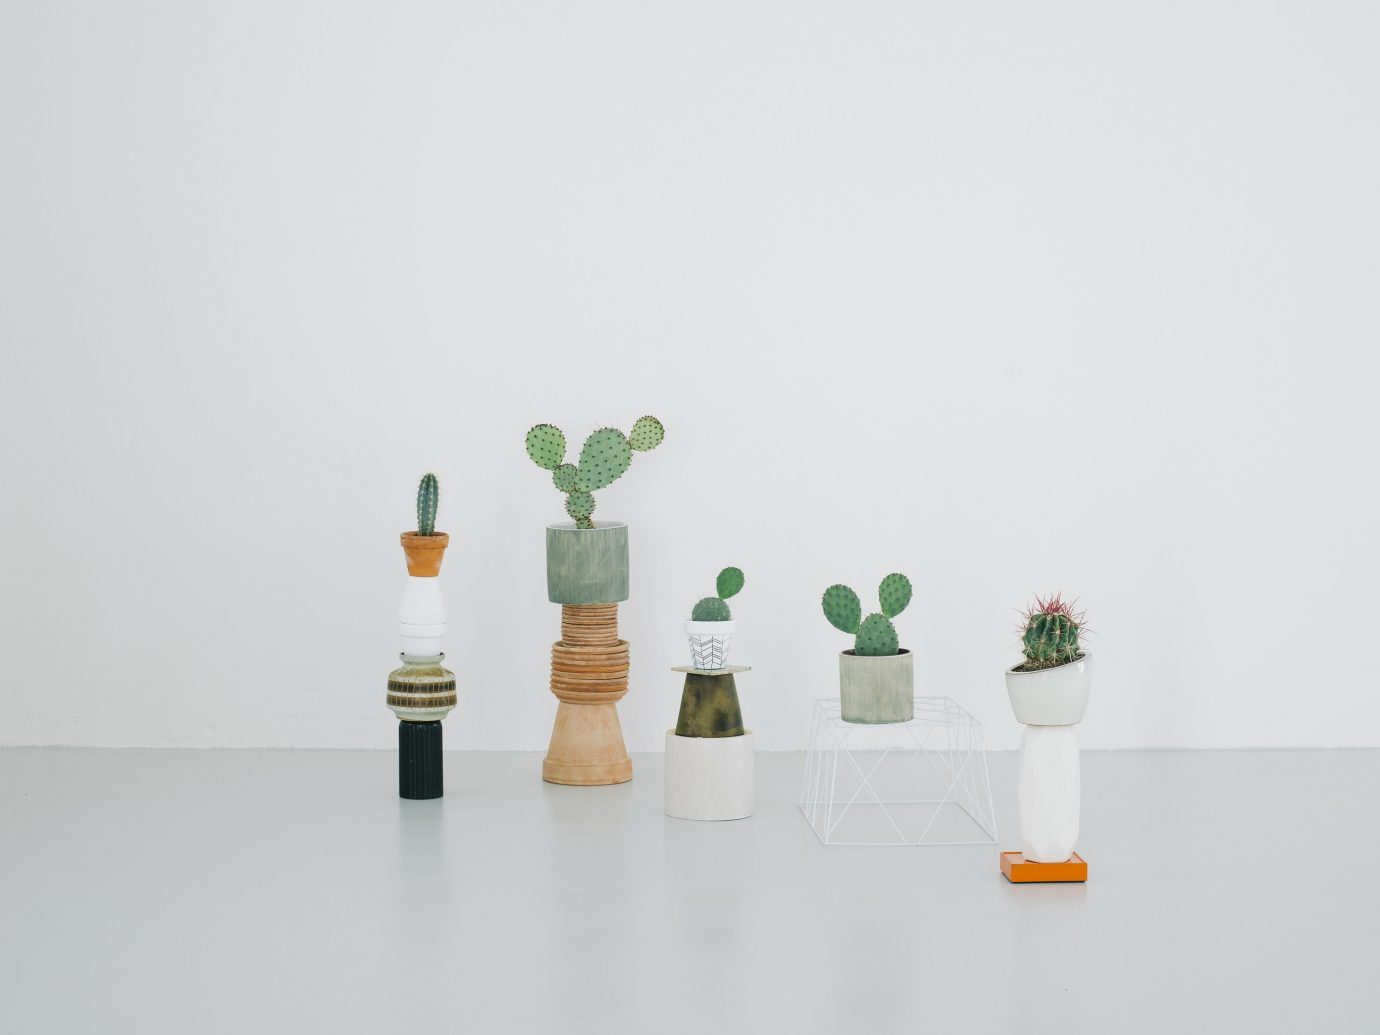 Offbeat Style + Design Travel Trends wall indoor product bottle plastic bottle product design plastic glass bottle drinkware vase